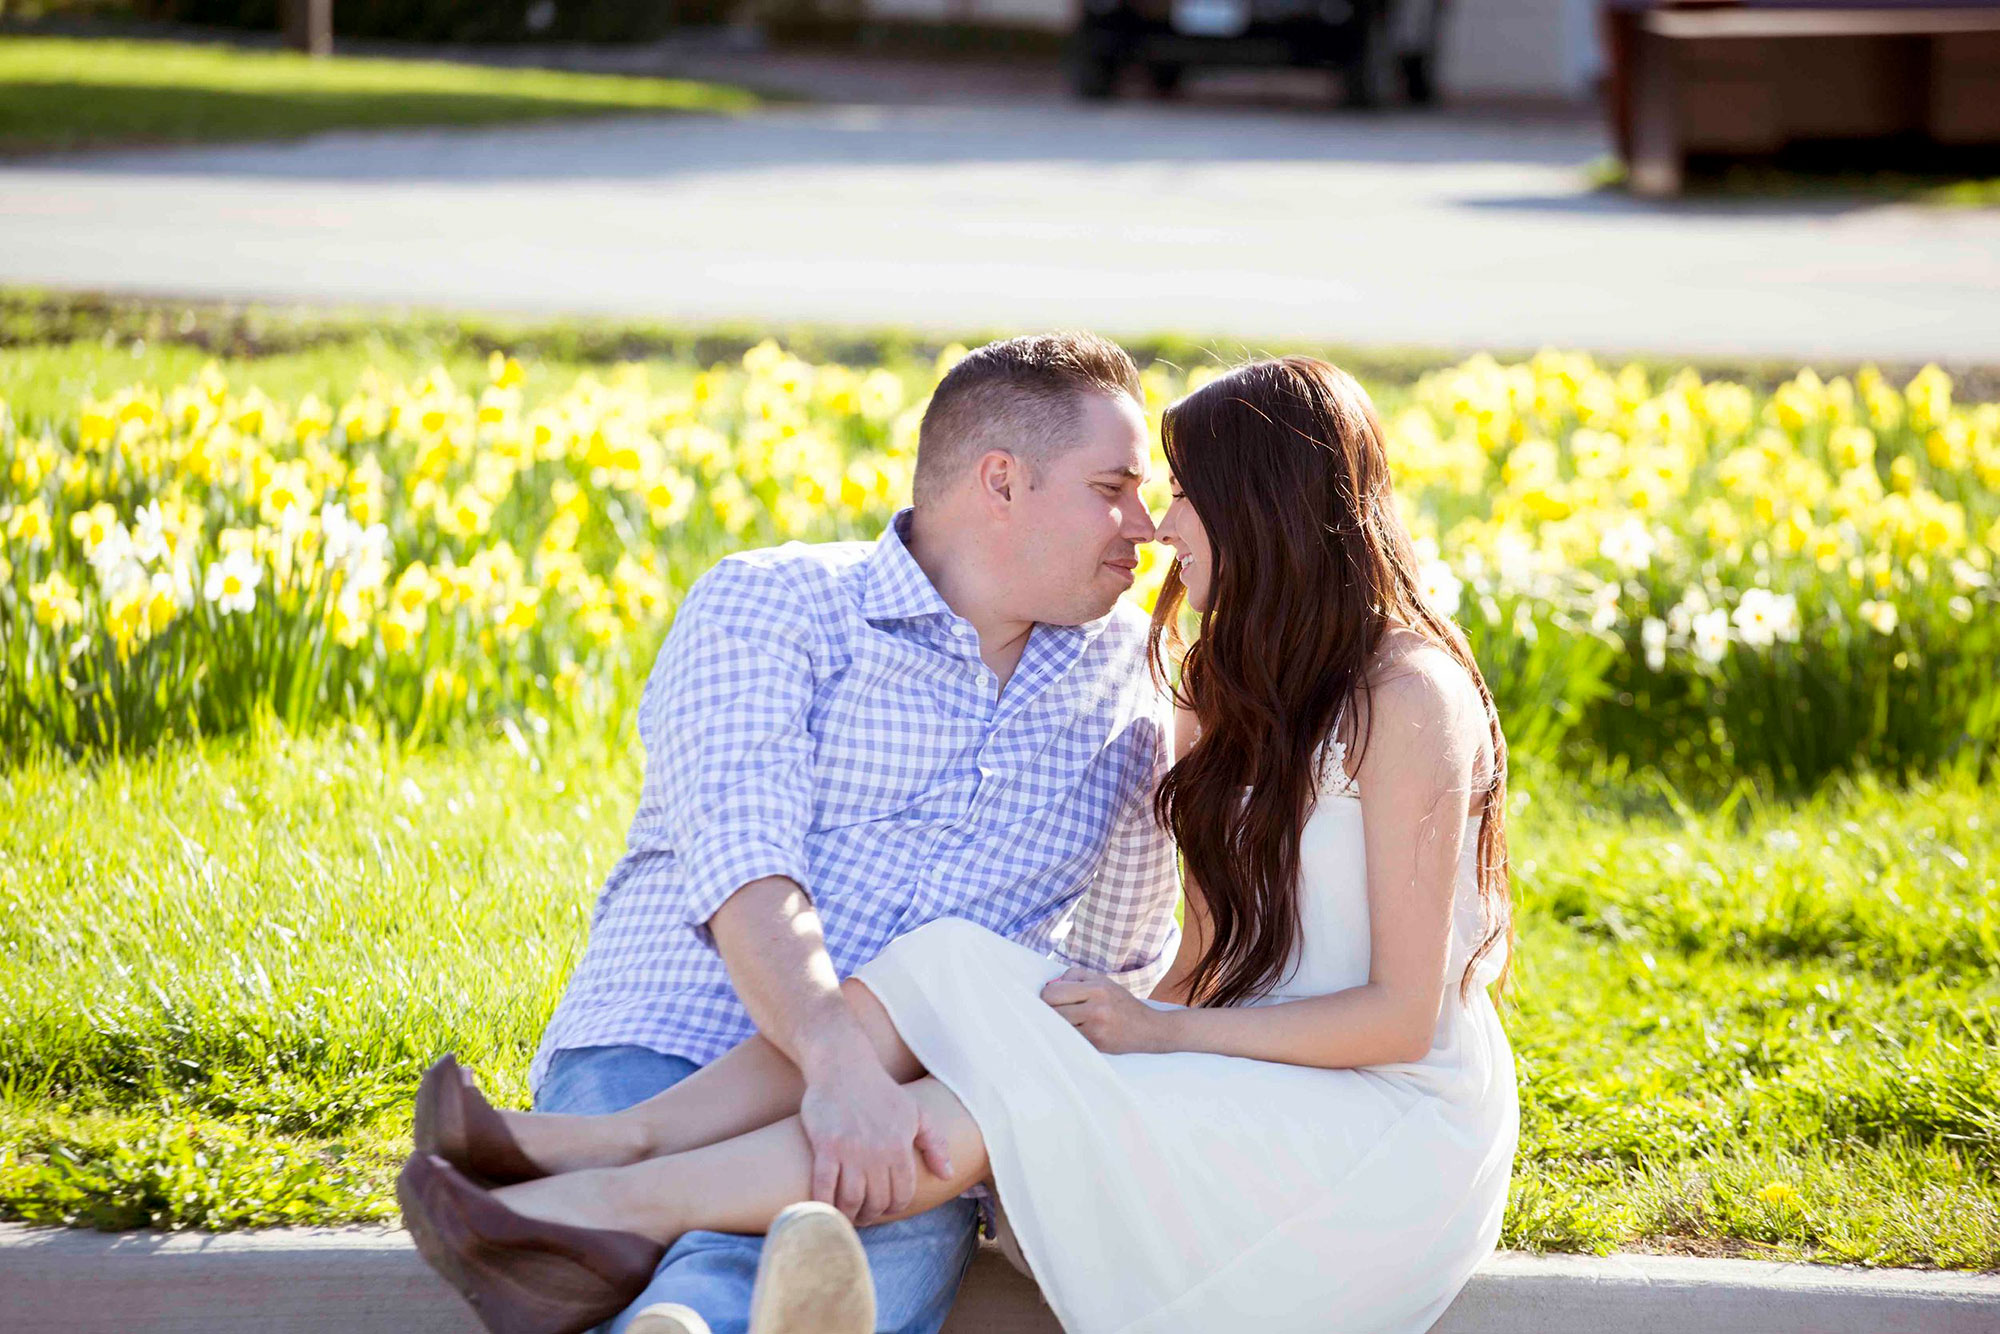 Niagara-on-the-Lake-Engagement-Vineyard-Bride-Photo-By-Gemini-Photography-011.jpg